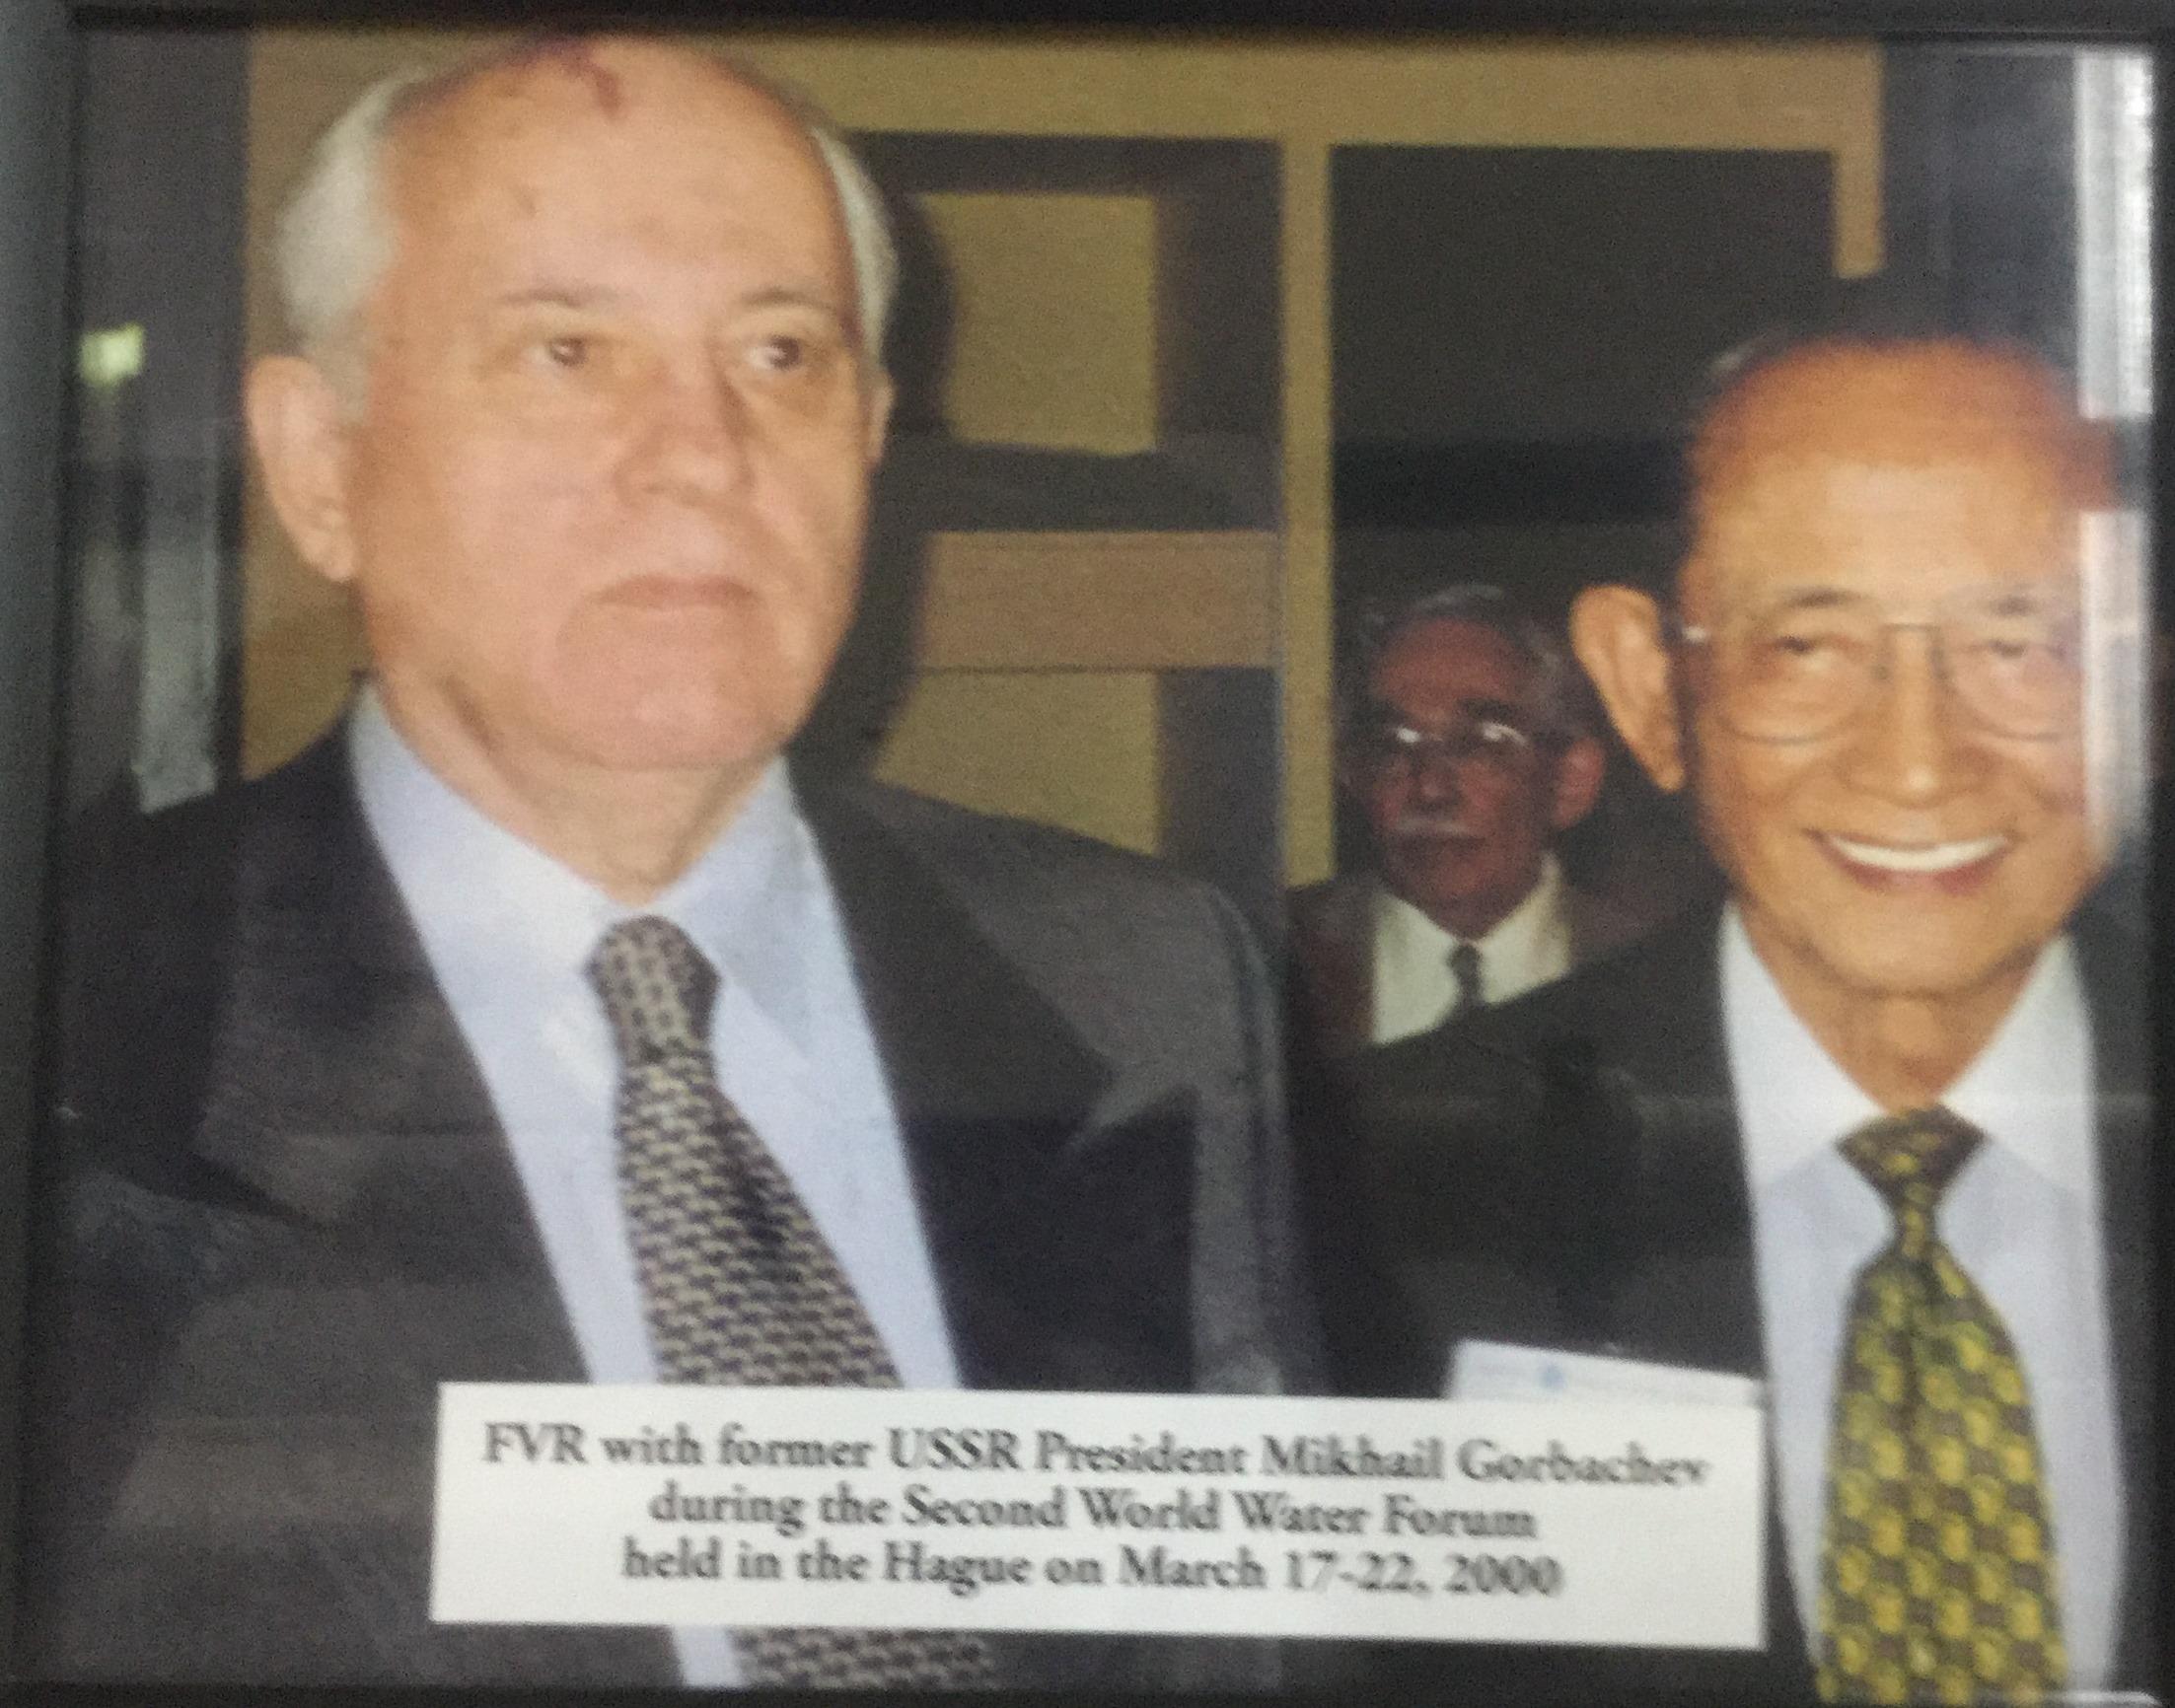 FVR with Former USSR President Mikhail Gorbachev